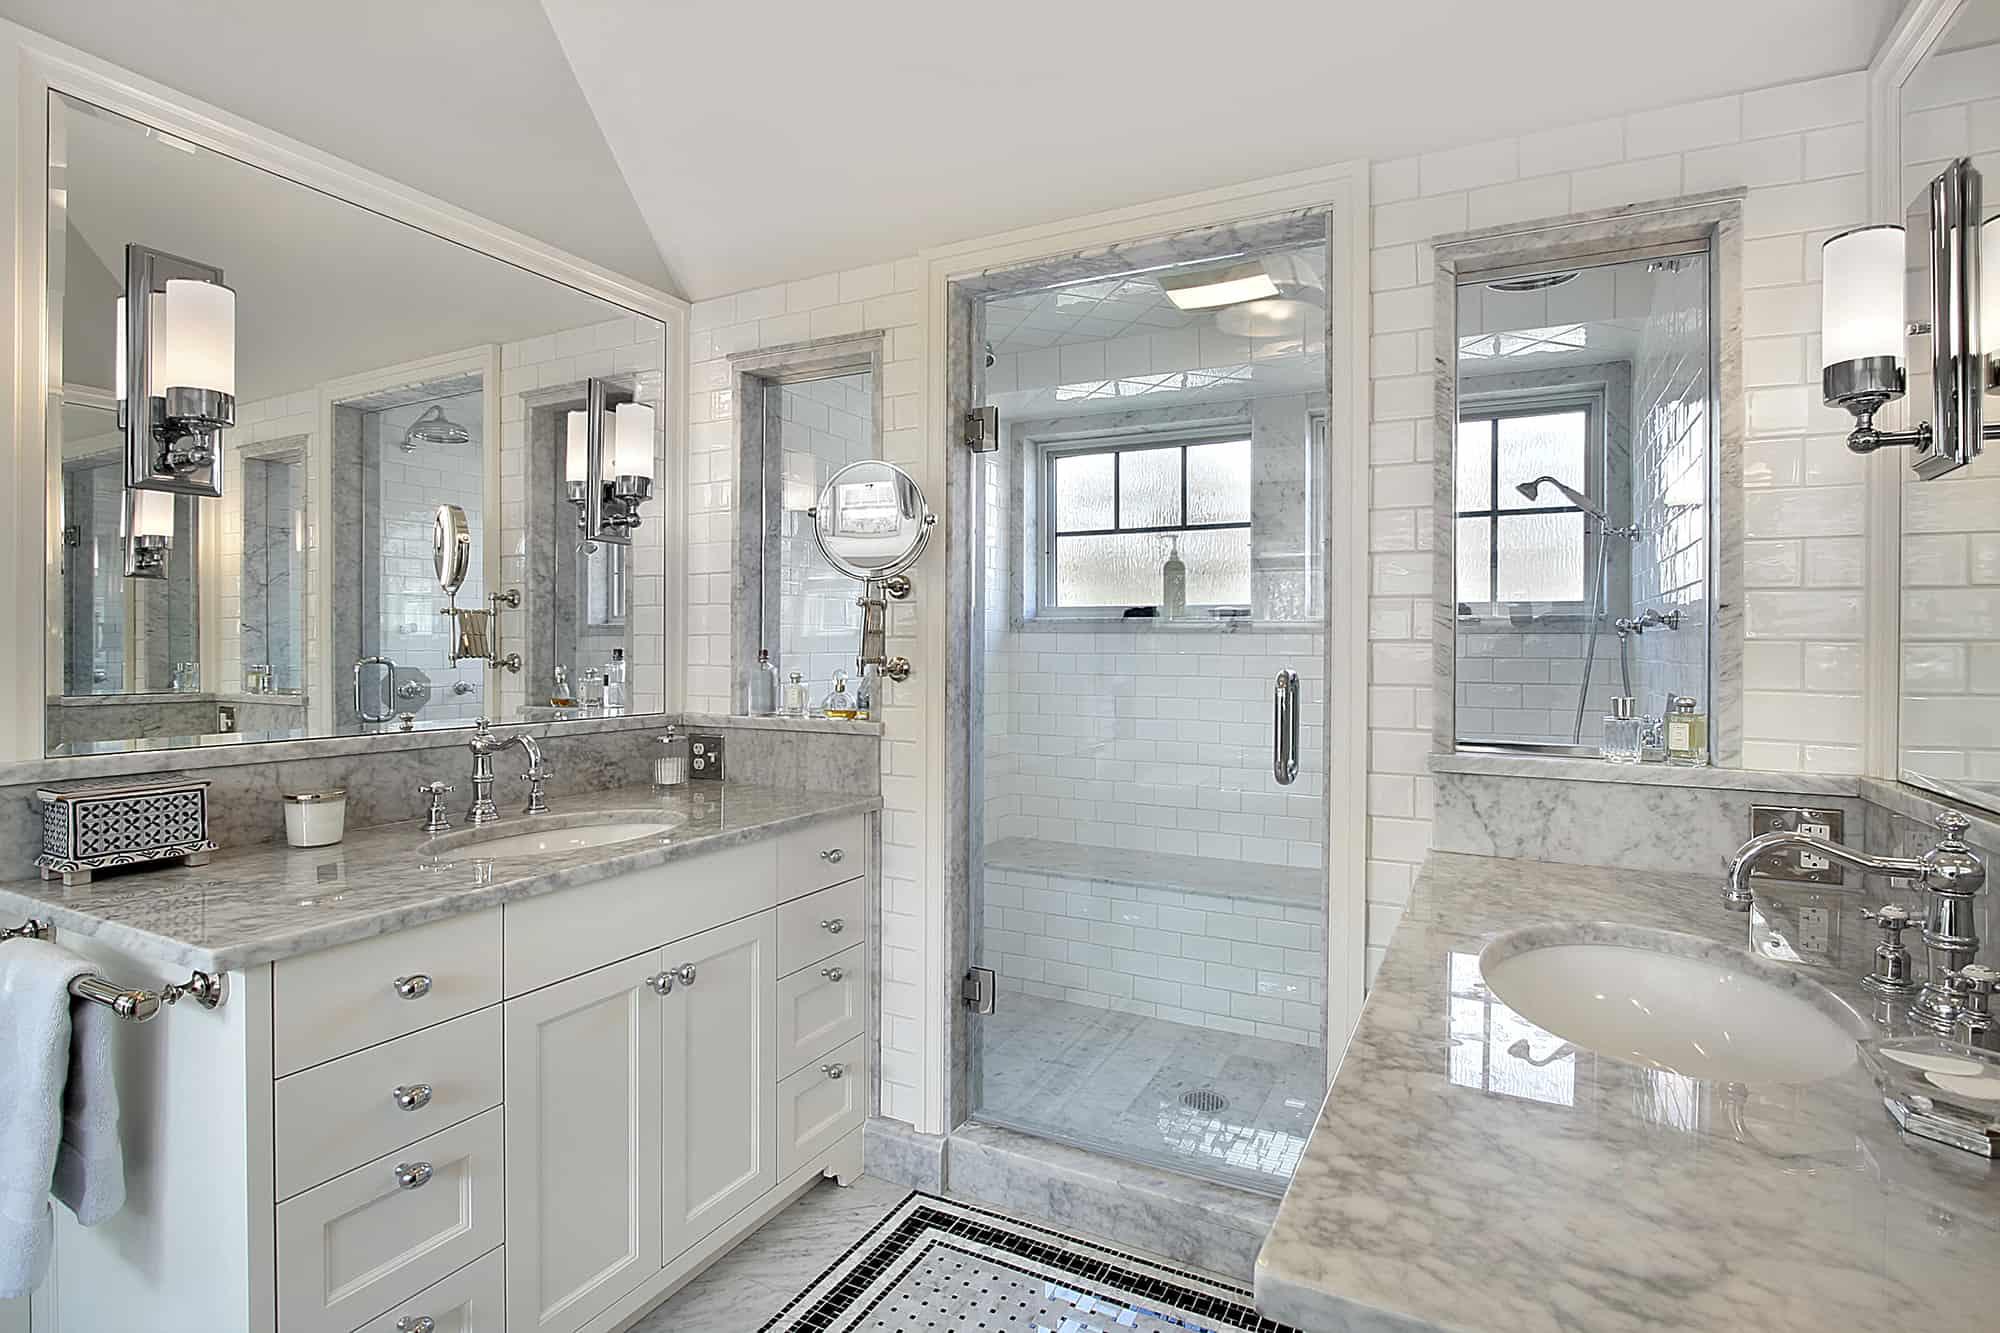 Kitchen & Bath Remodeling - Hammerhead Group